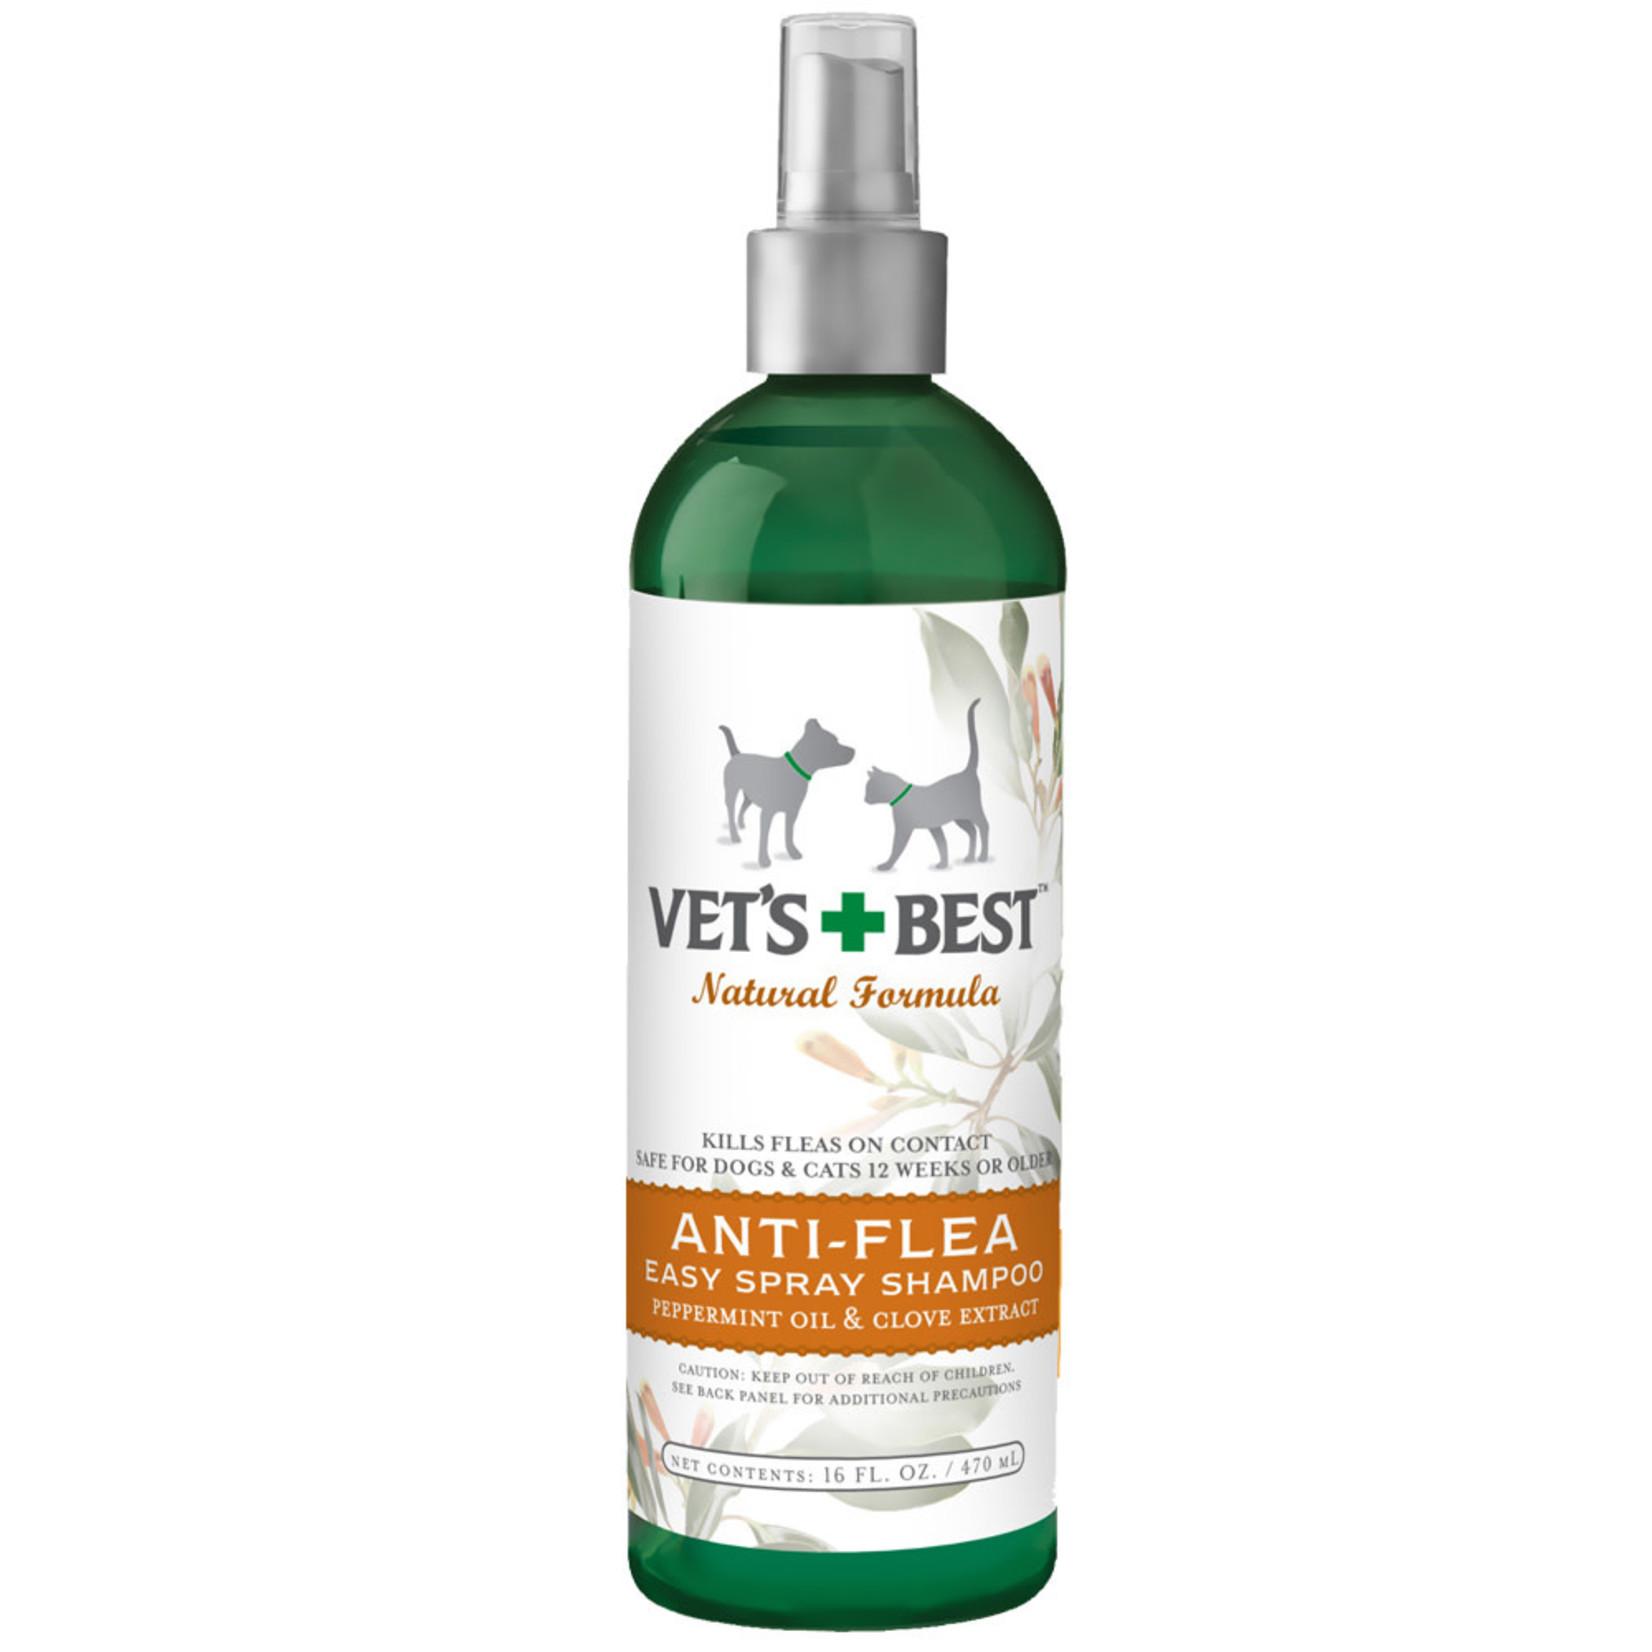 Vet's Best Vets Best Nat Anti-Flea Spray Shampoo 16 OZ